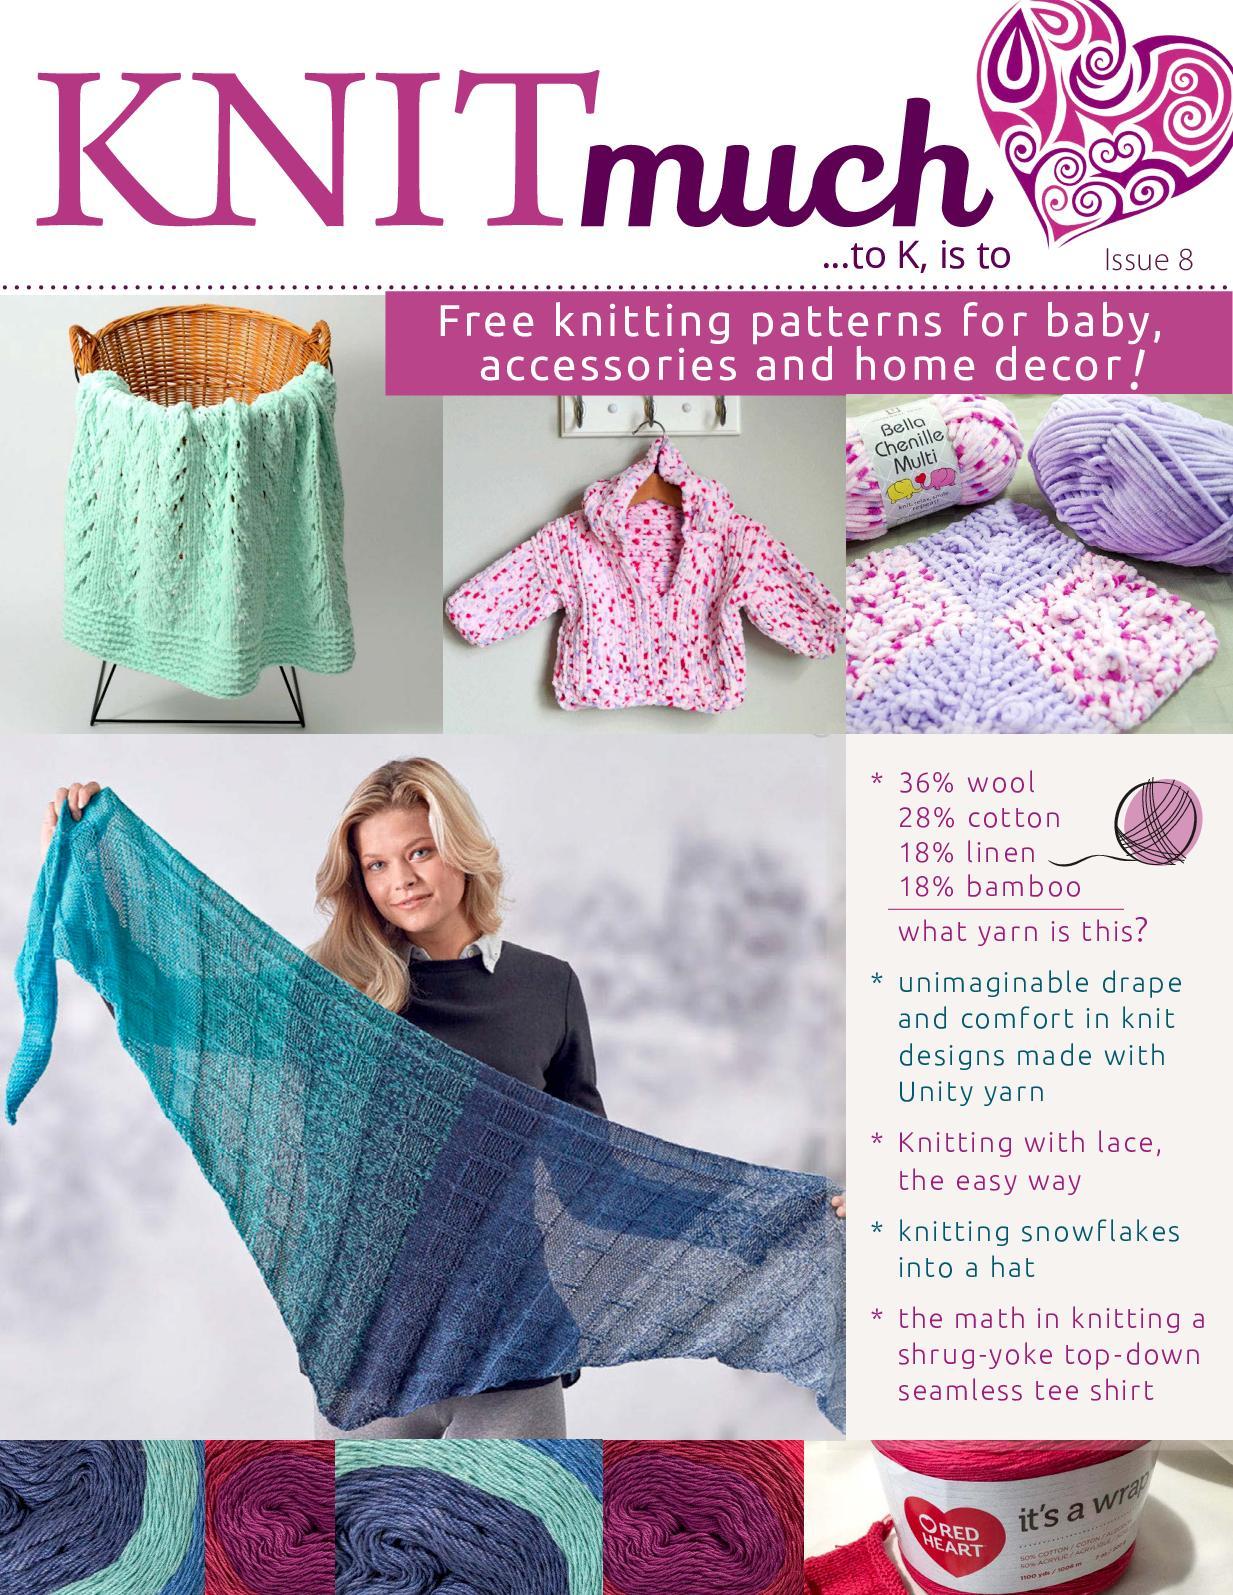 Large DIY Knitting Blanket Kit Soft Chunky Thick and Thin Bulky Yarn US 15 Needles Dark Purple